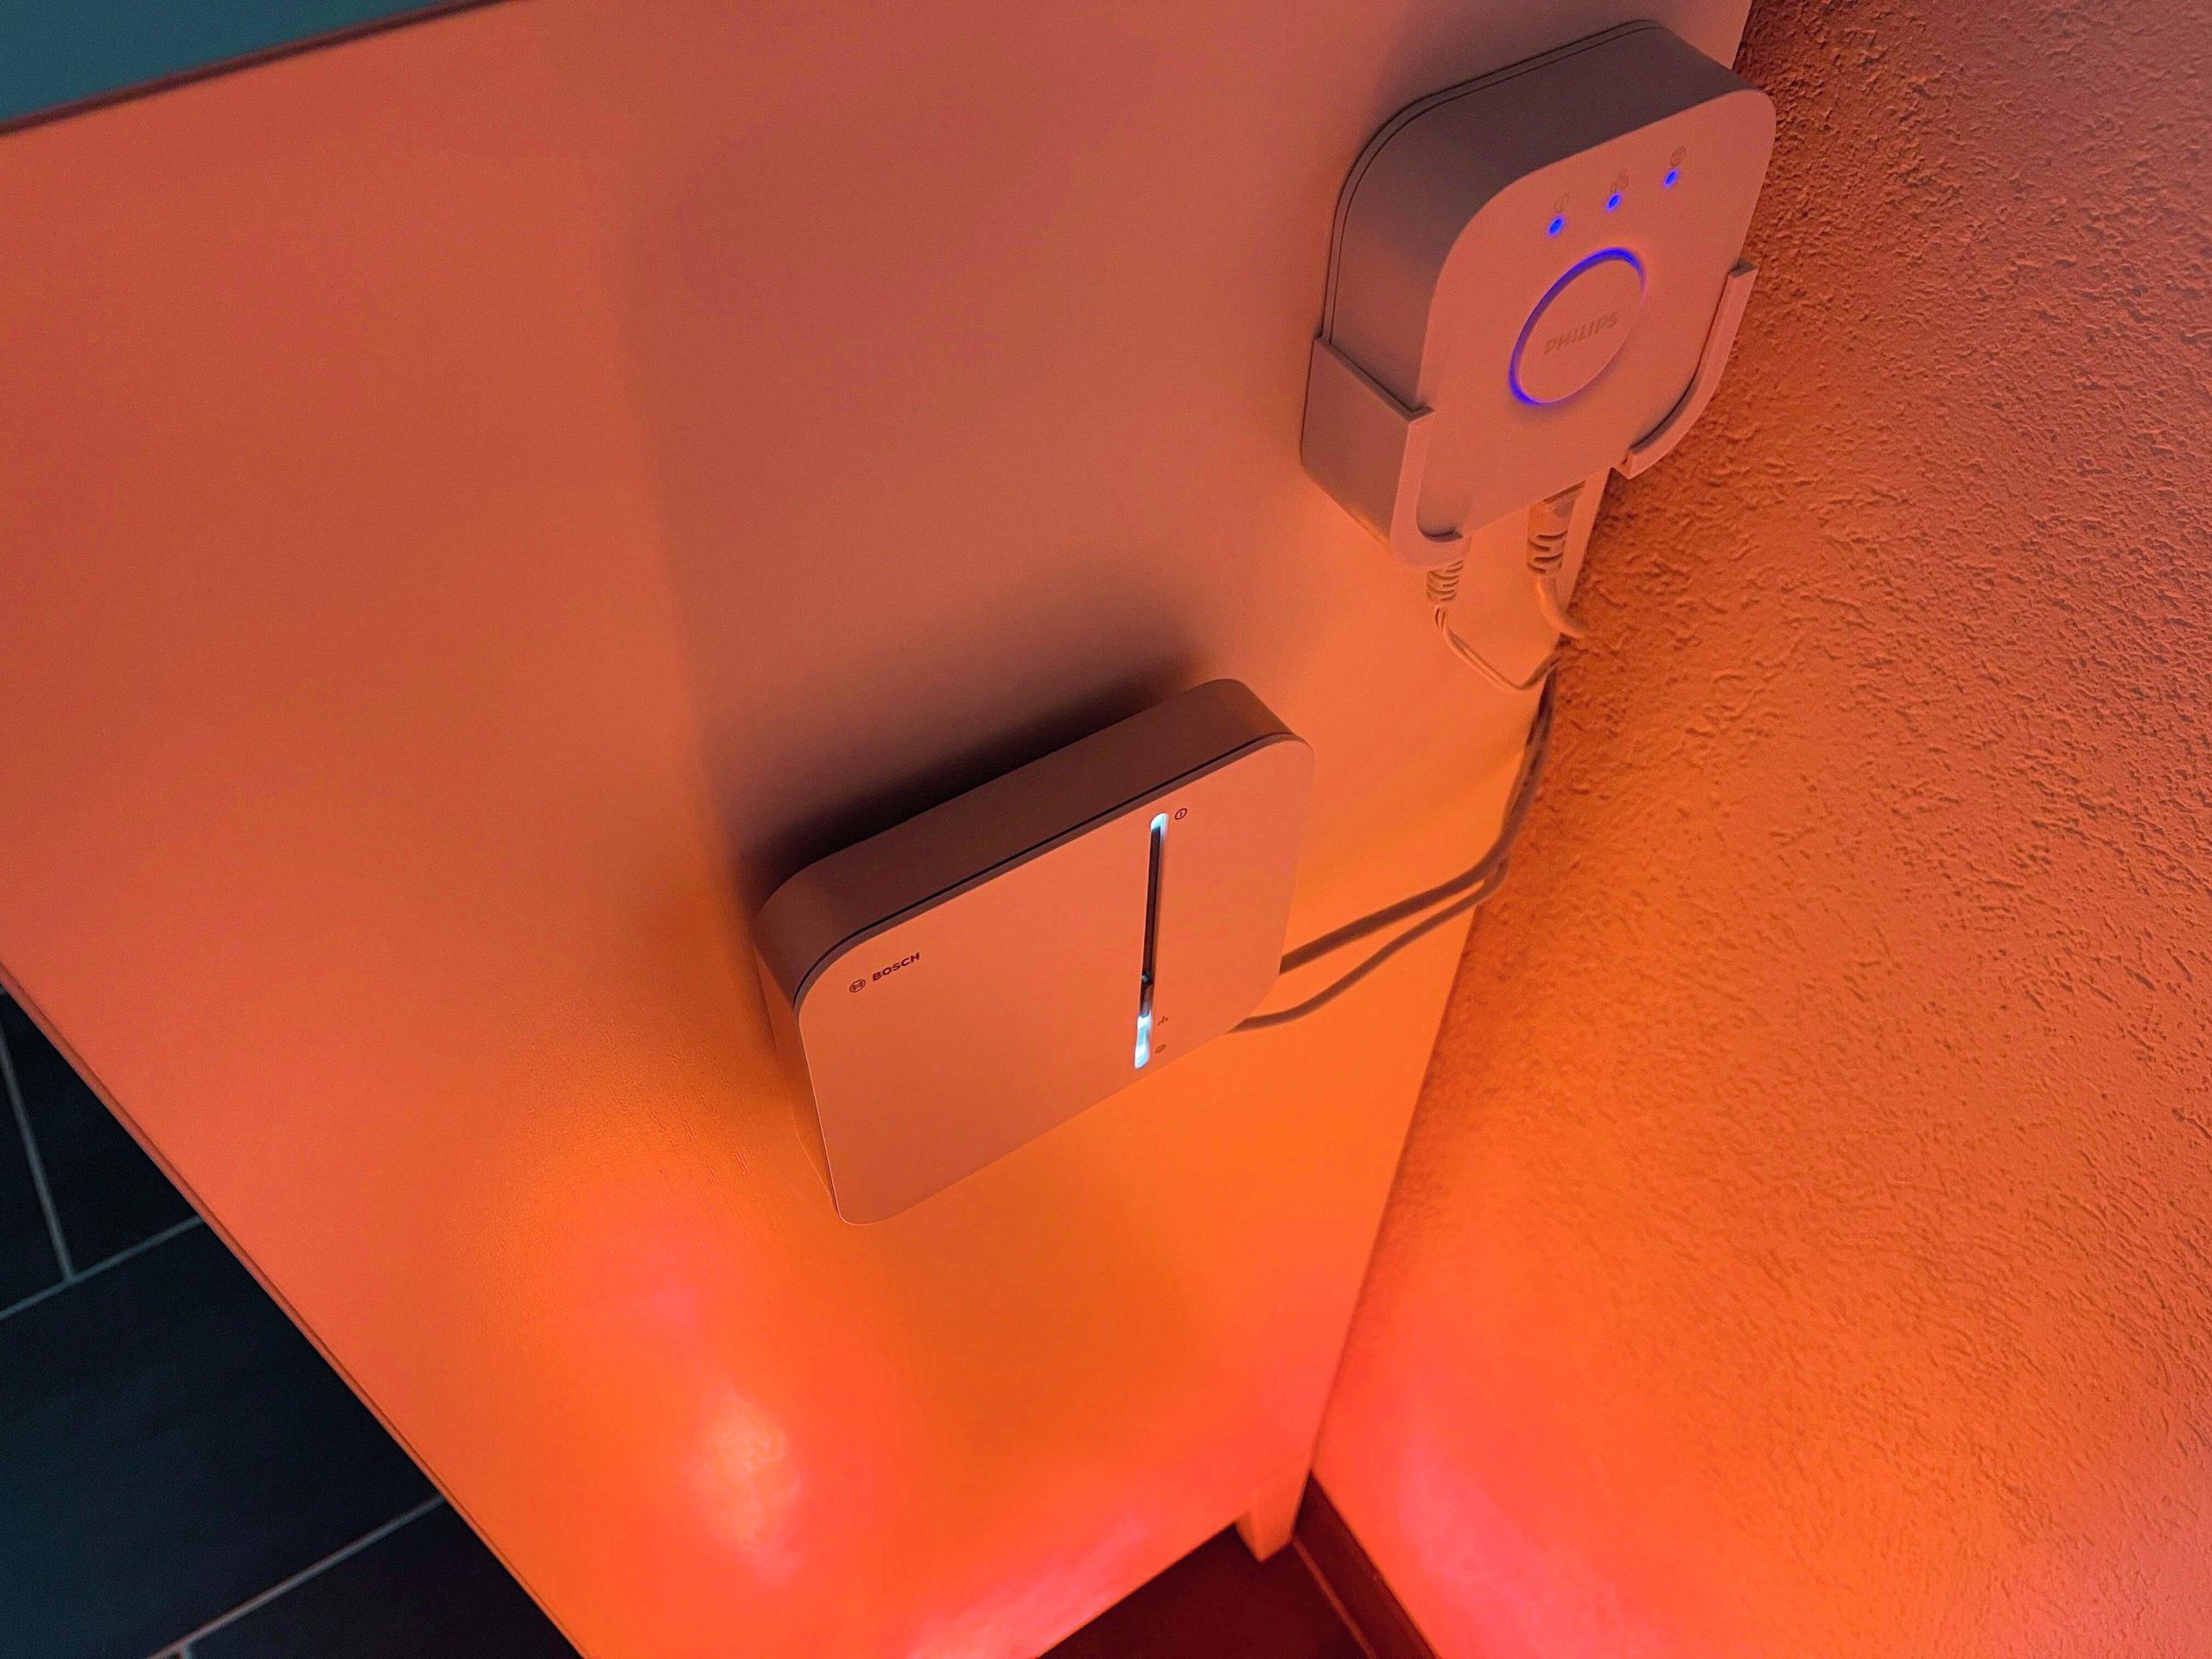 Bosch-Smart-Home-in-Perfektion-mit-Apple-HomeKit5-scaled Bosch Smart Home - in Perfektion mit Apple HomeKit